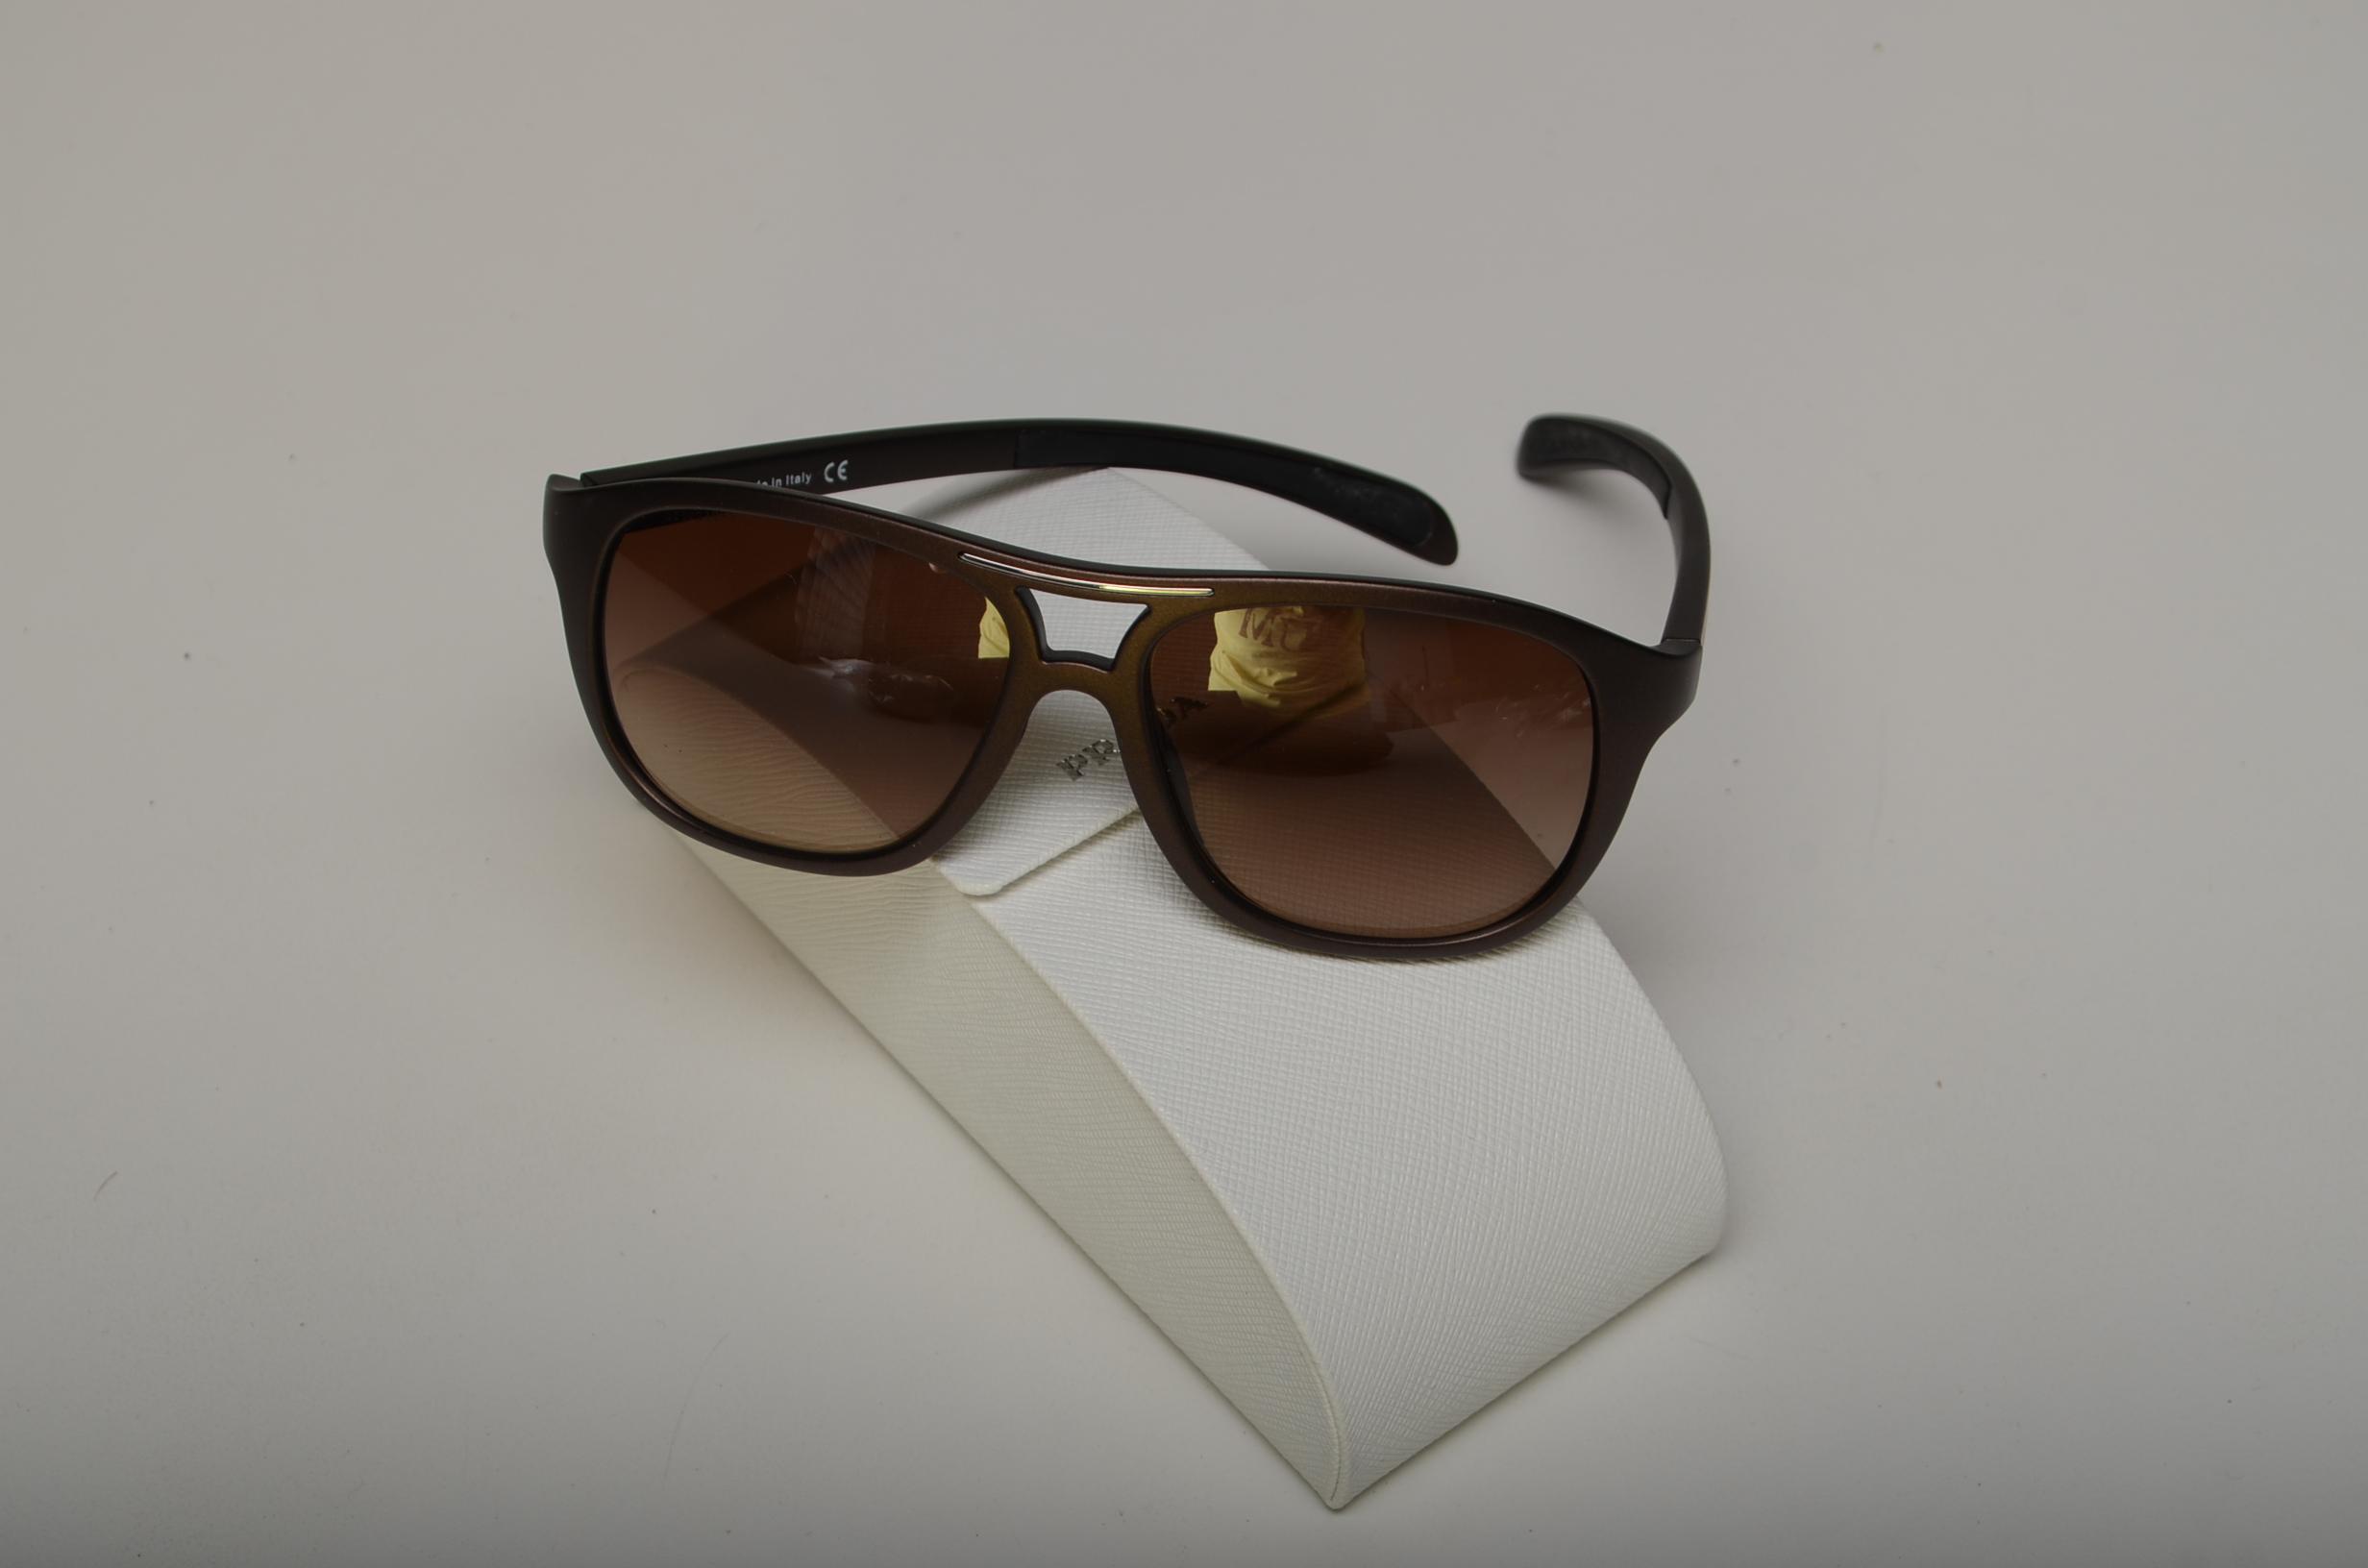 d31144d6659e Lyst Prada  u002639 cin u00e9ma u002639  Sunglasses in Pink - FS MAG